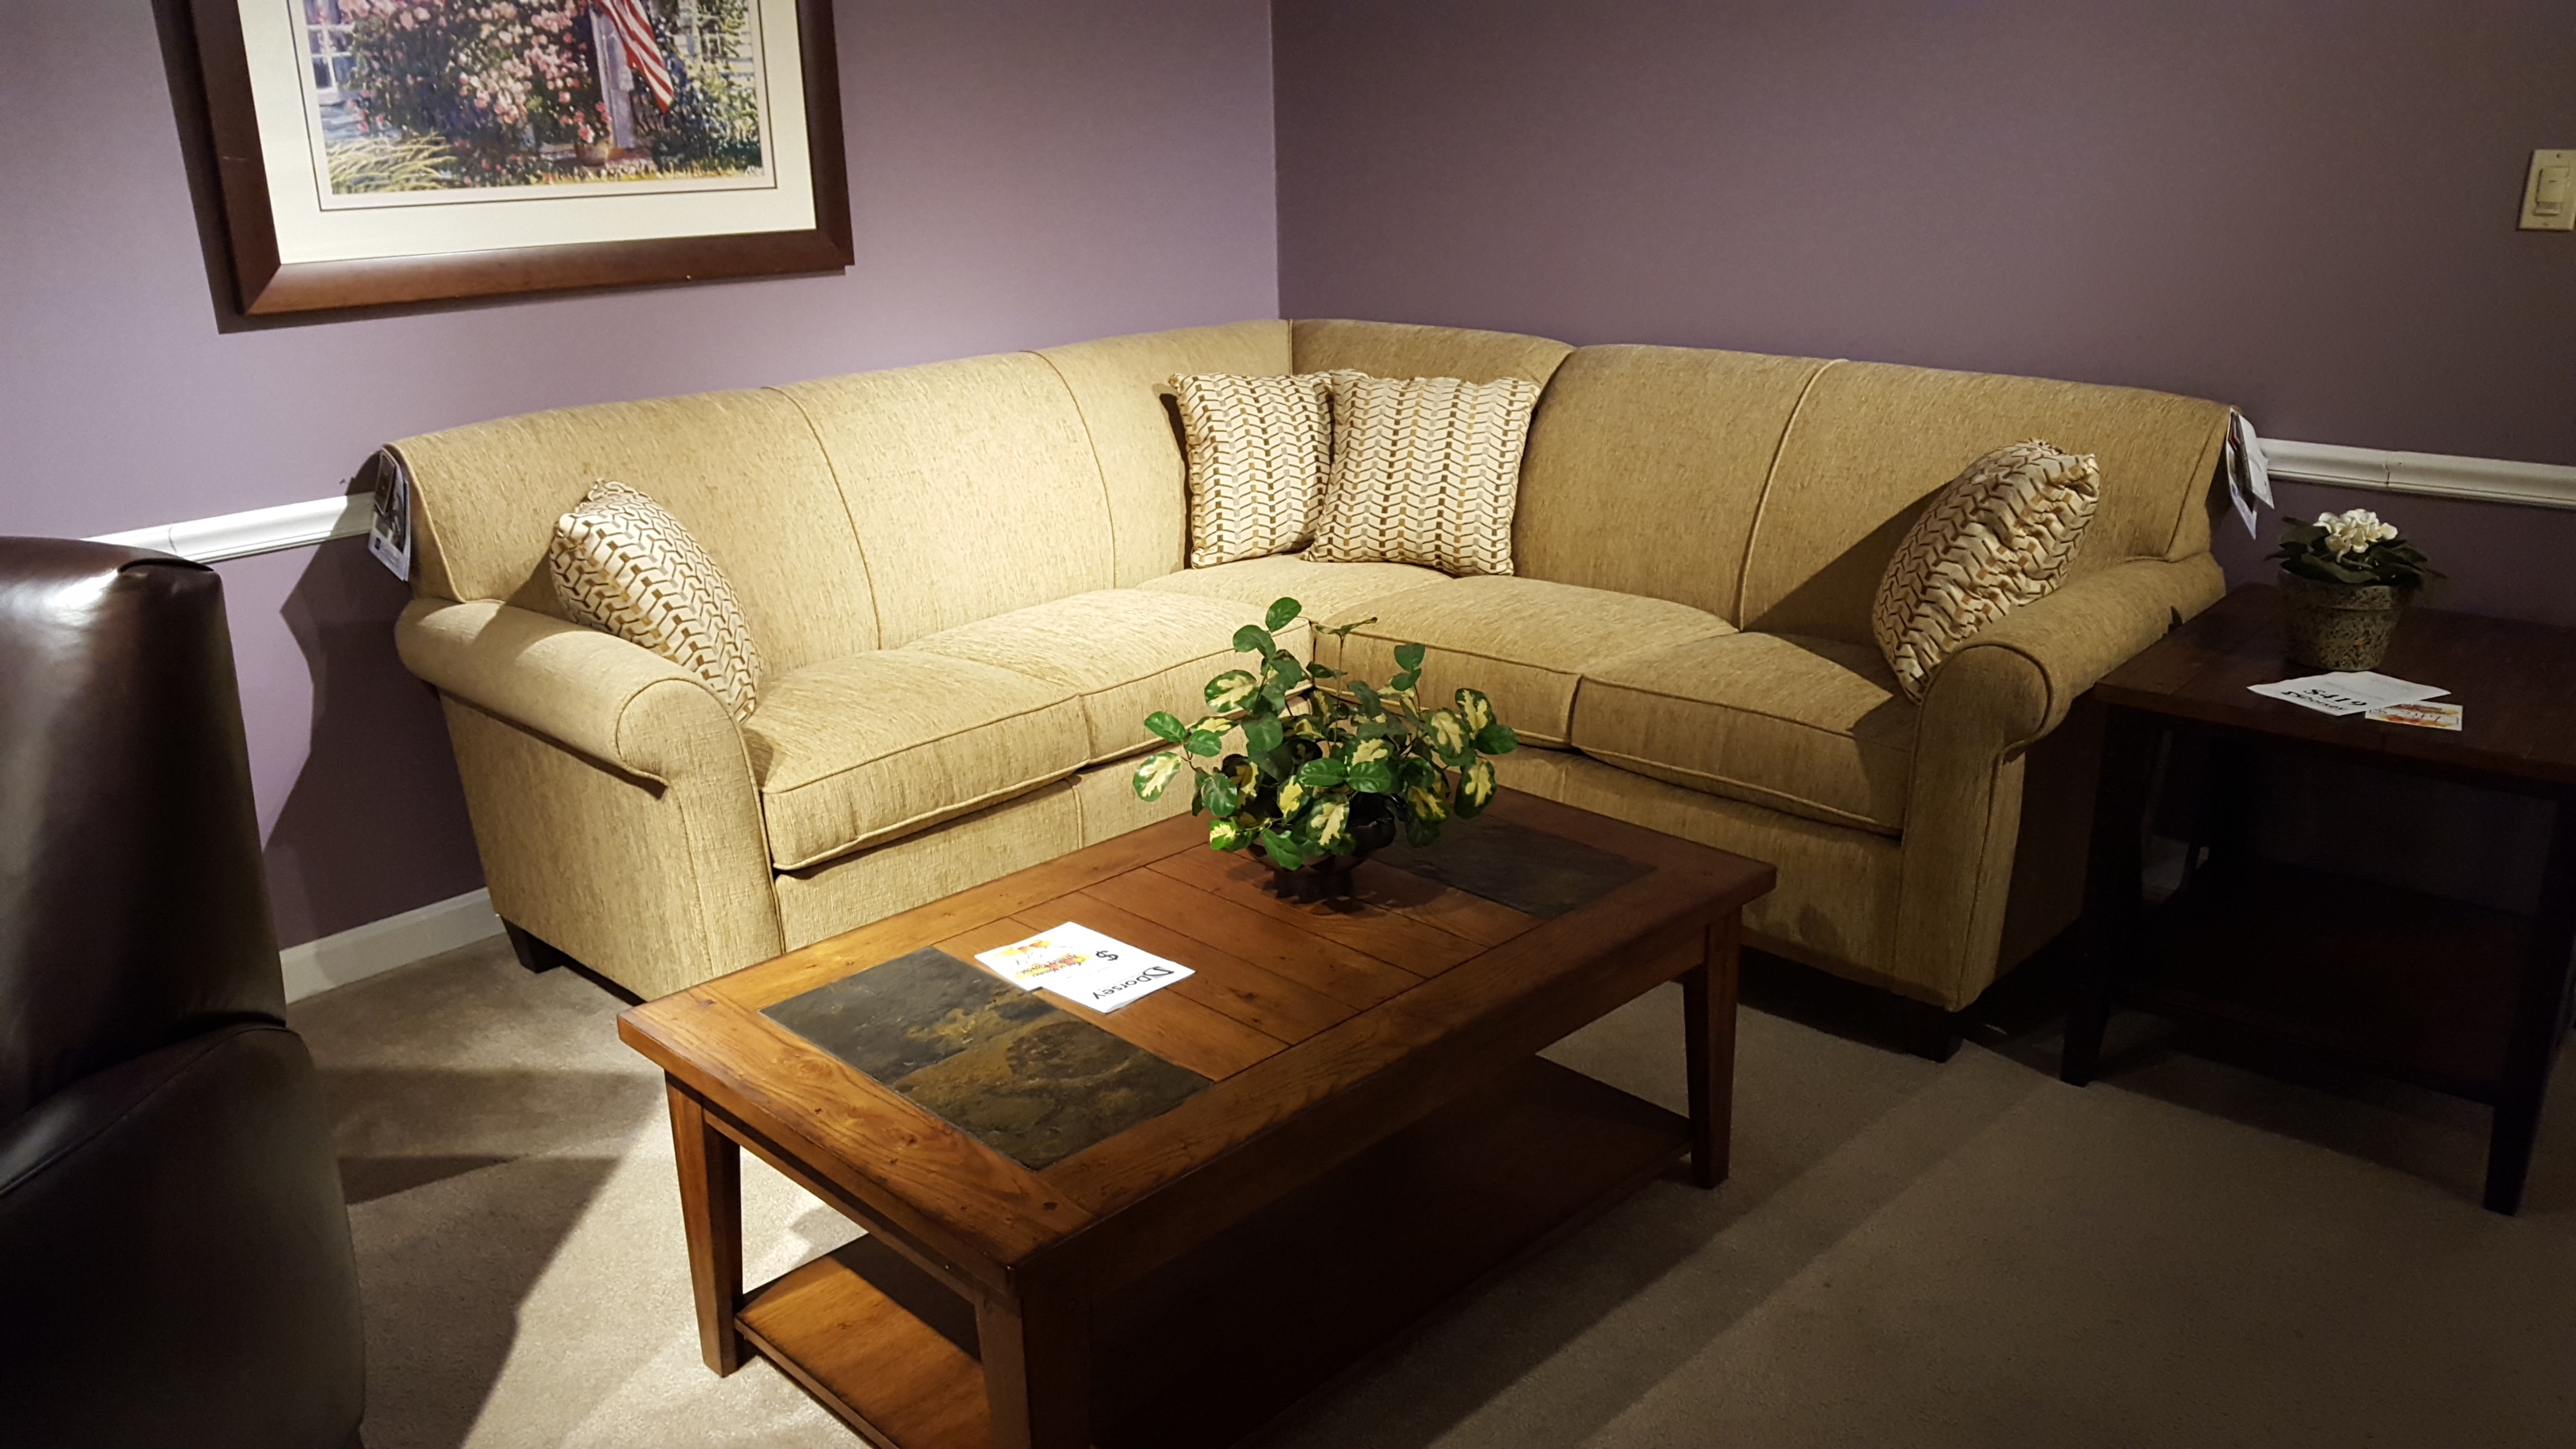 Flexsteel 5990 sectional - Furniture Store Bangor, Maine ... - photo#5